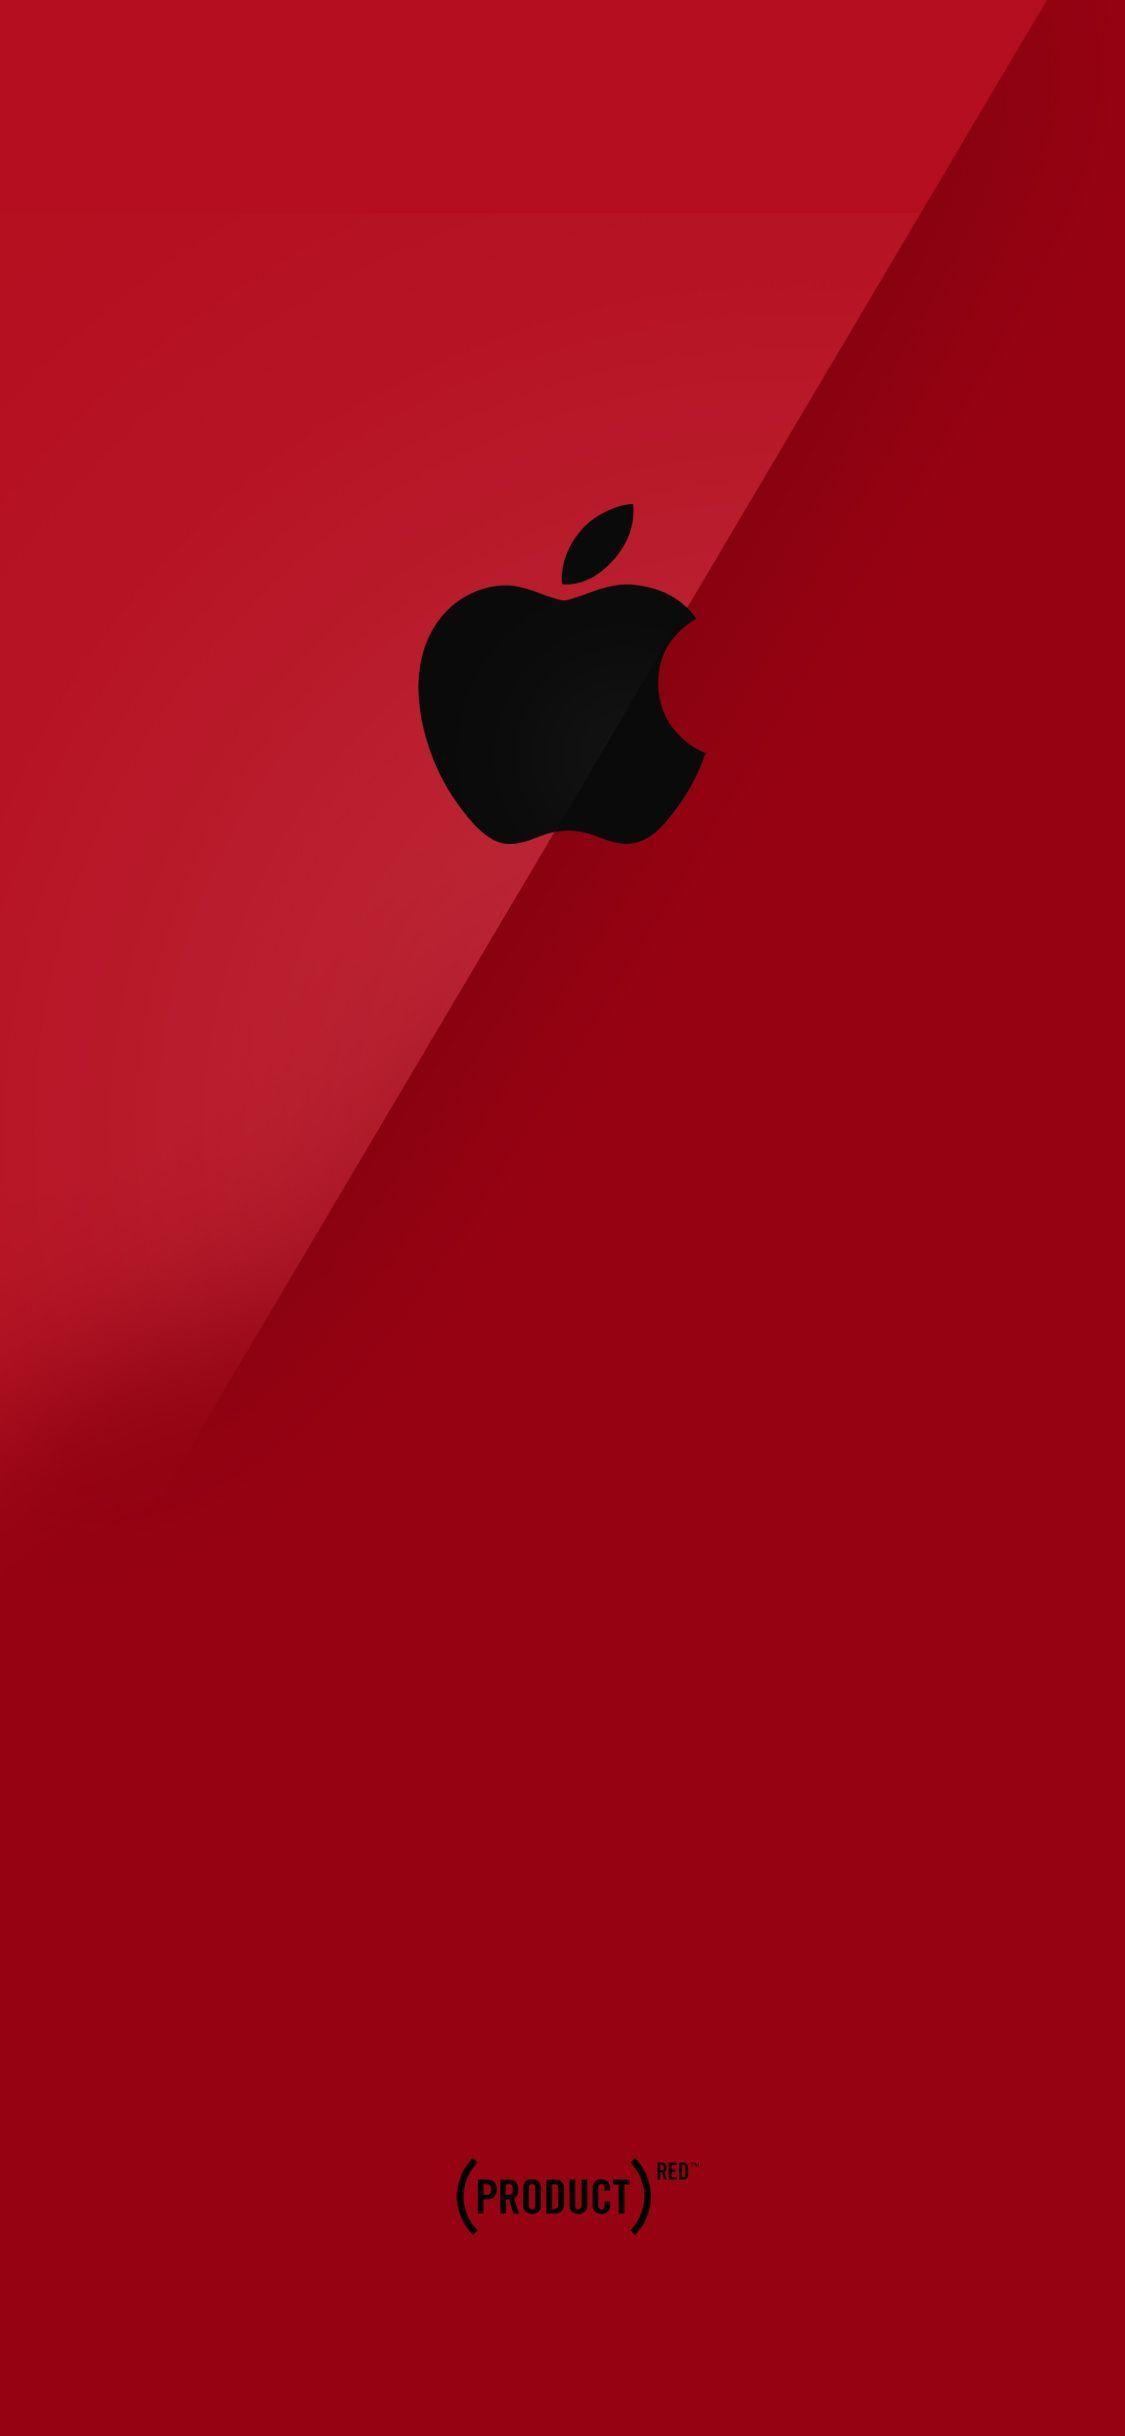 Black With Red Trim Apple On Black Wallpaper Apple Logo Wallpaper Iphone Apple Wallpaper Iphone Apple Wallpaper